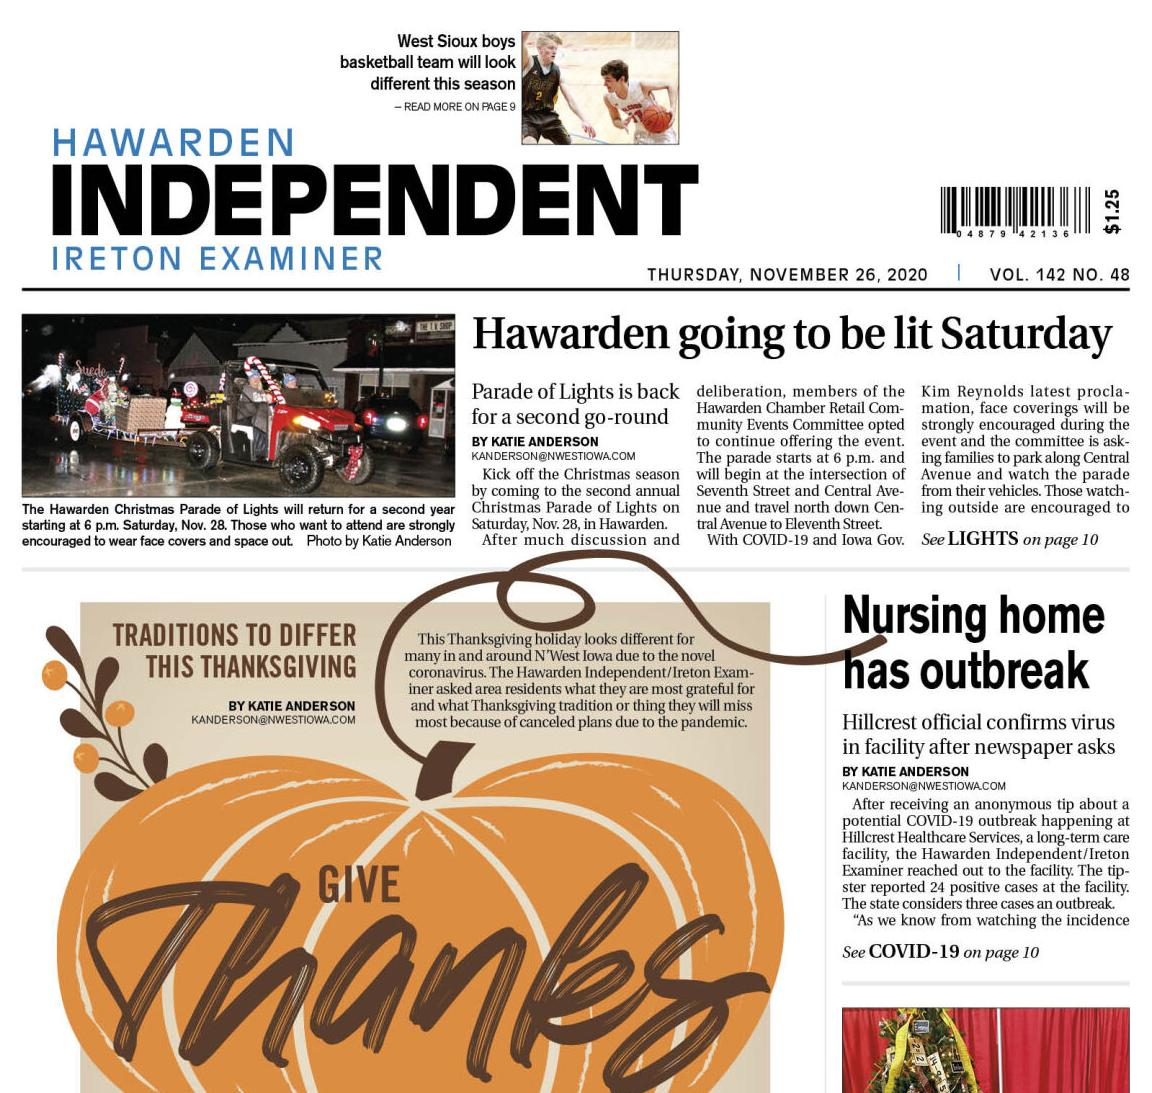 Hawarden Independent/Ireton Examiner Nov. 26, 2020